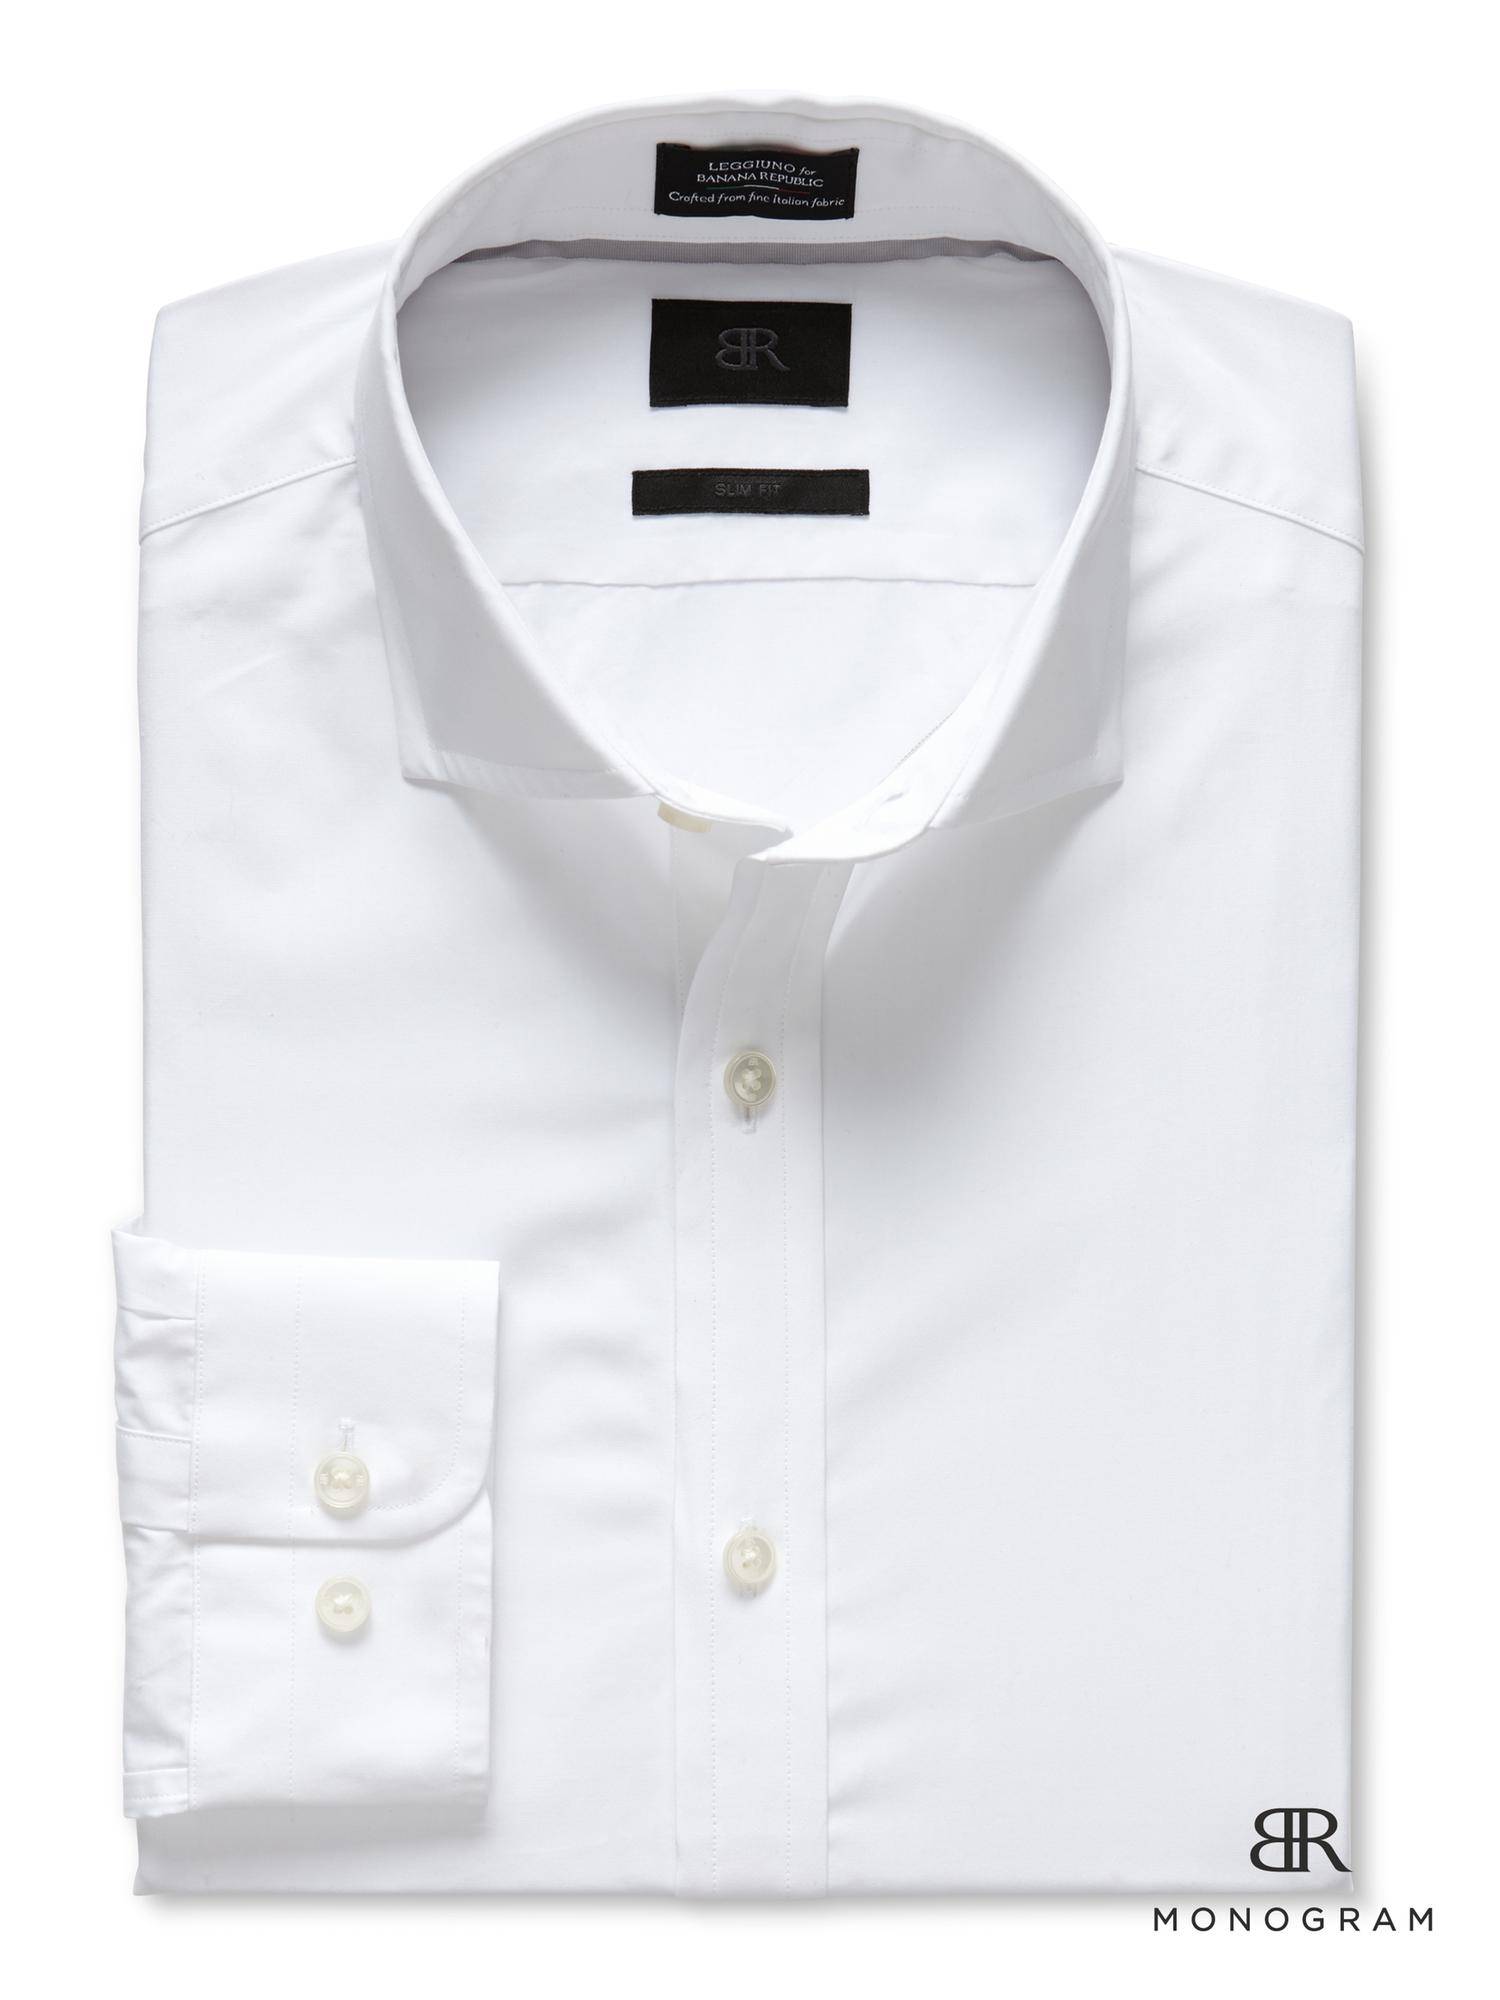 Banana Republic Br Monogram Italian Woven Dress Shirt In